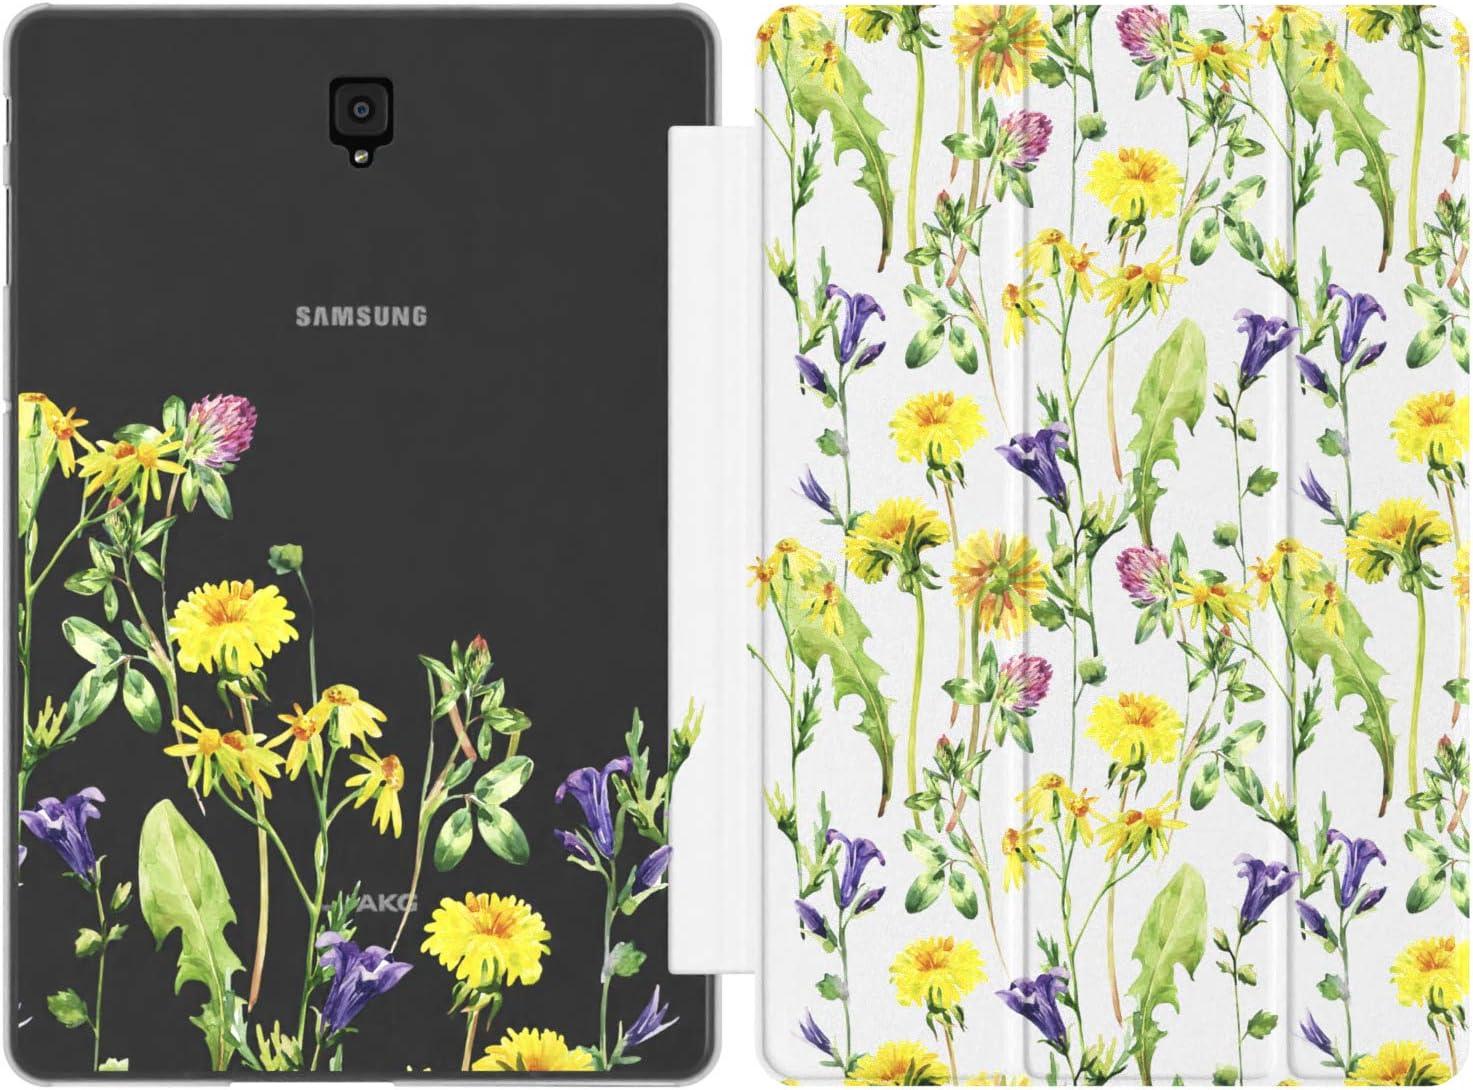 Mertak Case Compatible with Samsung Galaxy Tab S6 Lite S5e S4 A 10.5 A 10.1 2019 S3 S2 A 8.0 9.7 E Meadow Plant Dandelion Auto Wake Sleep Cute Design Flowers Floral Print Magnetic Closure Summer